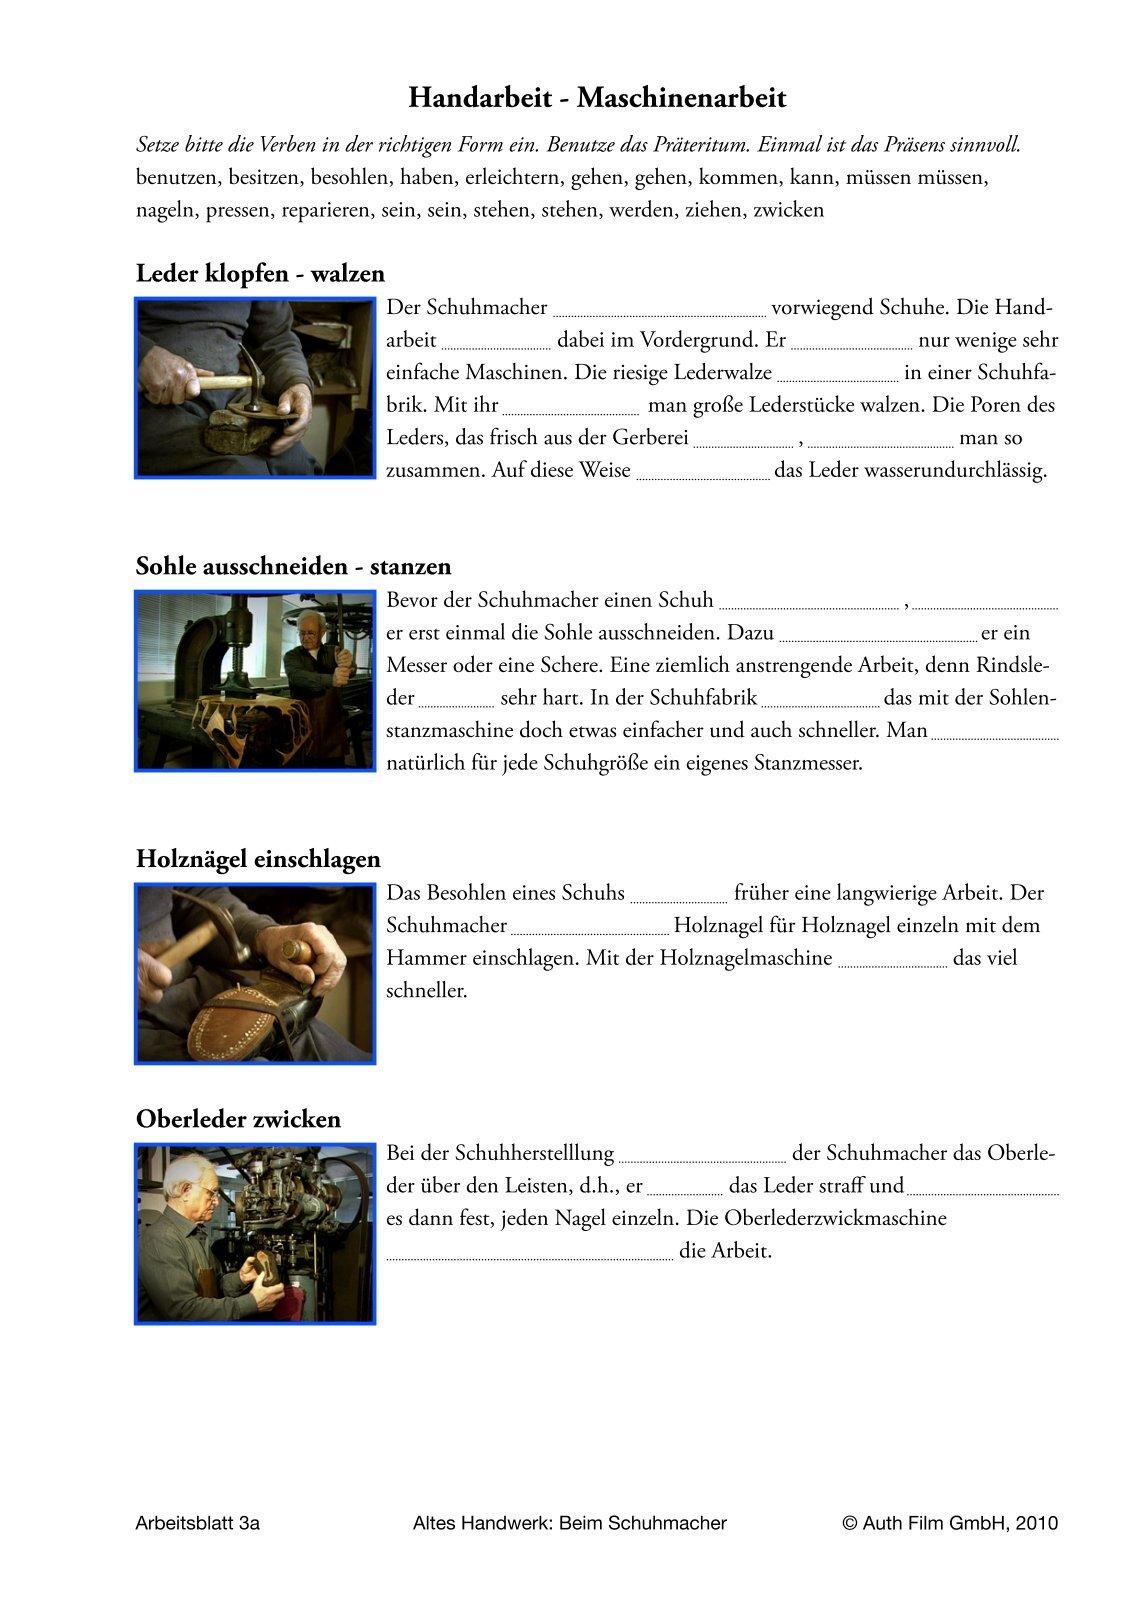 4 free Magazines from AUTH.FILM.DE